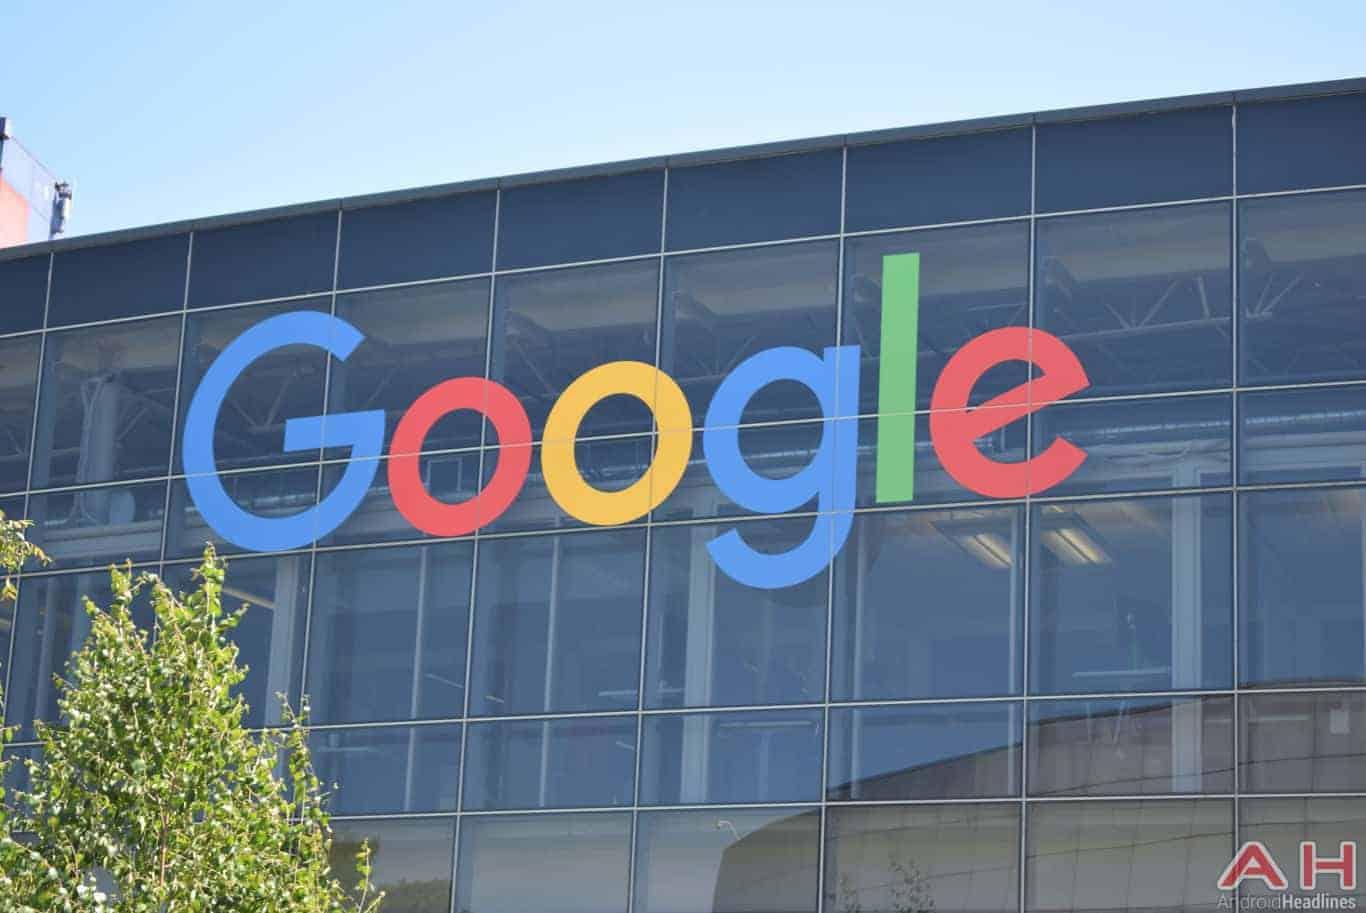 Googleplex Google Logo AH 10